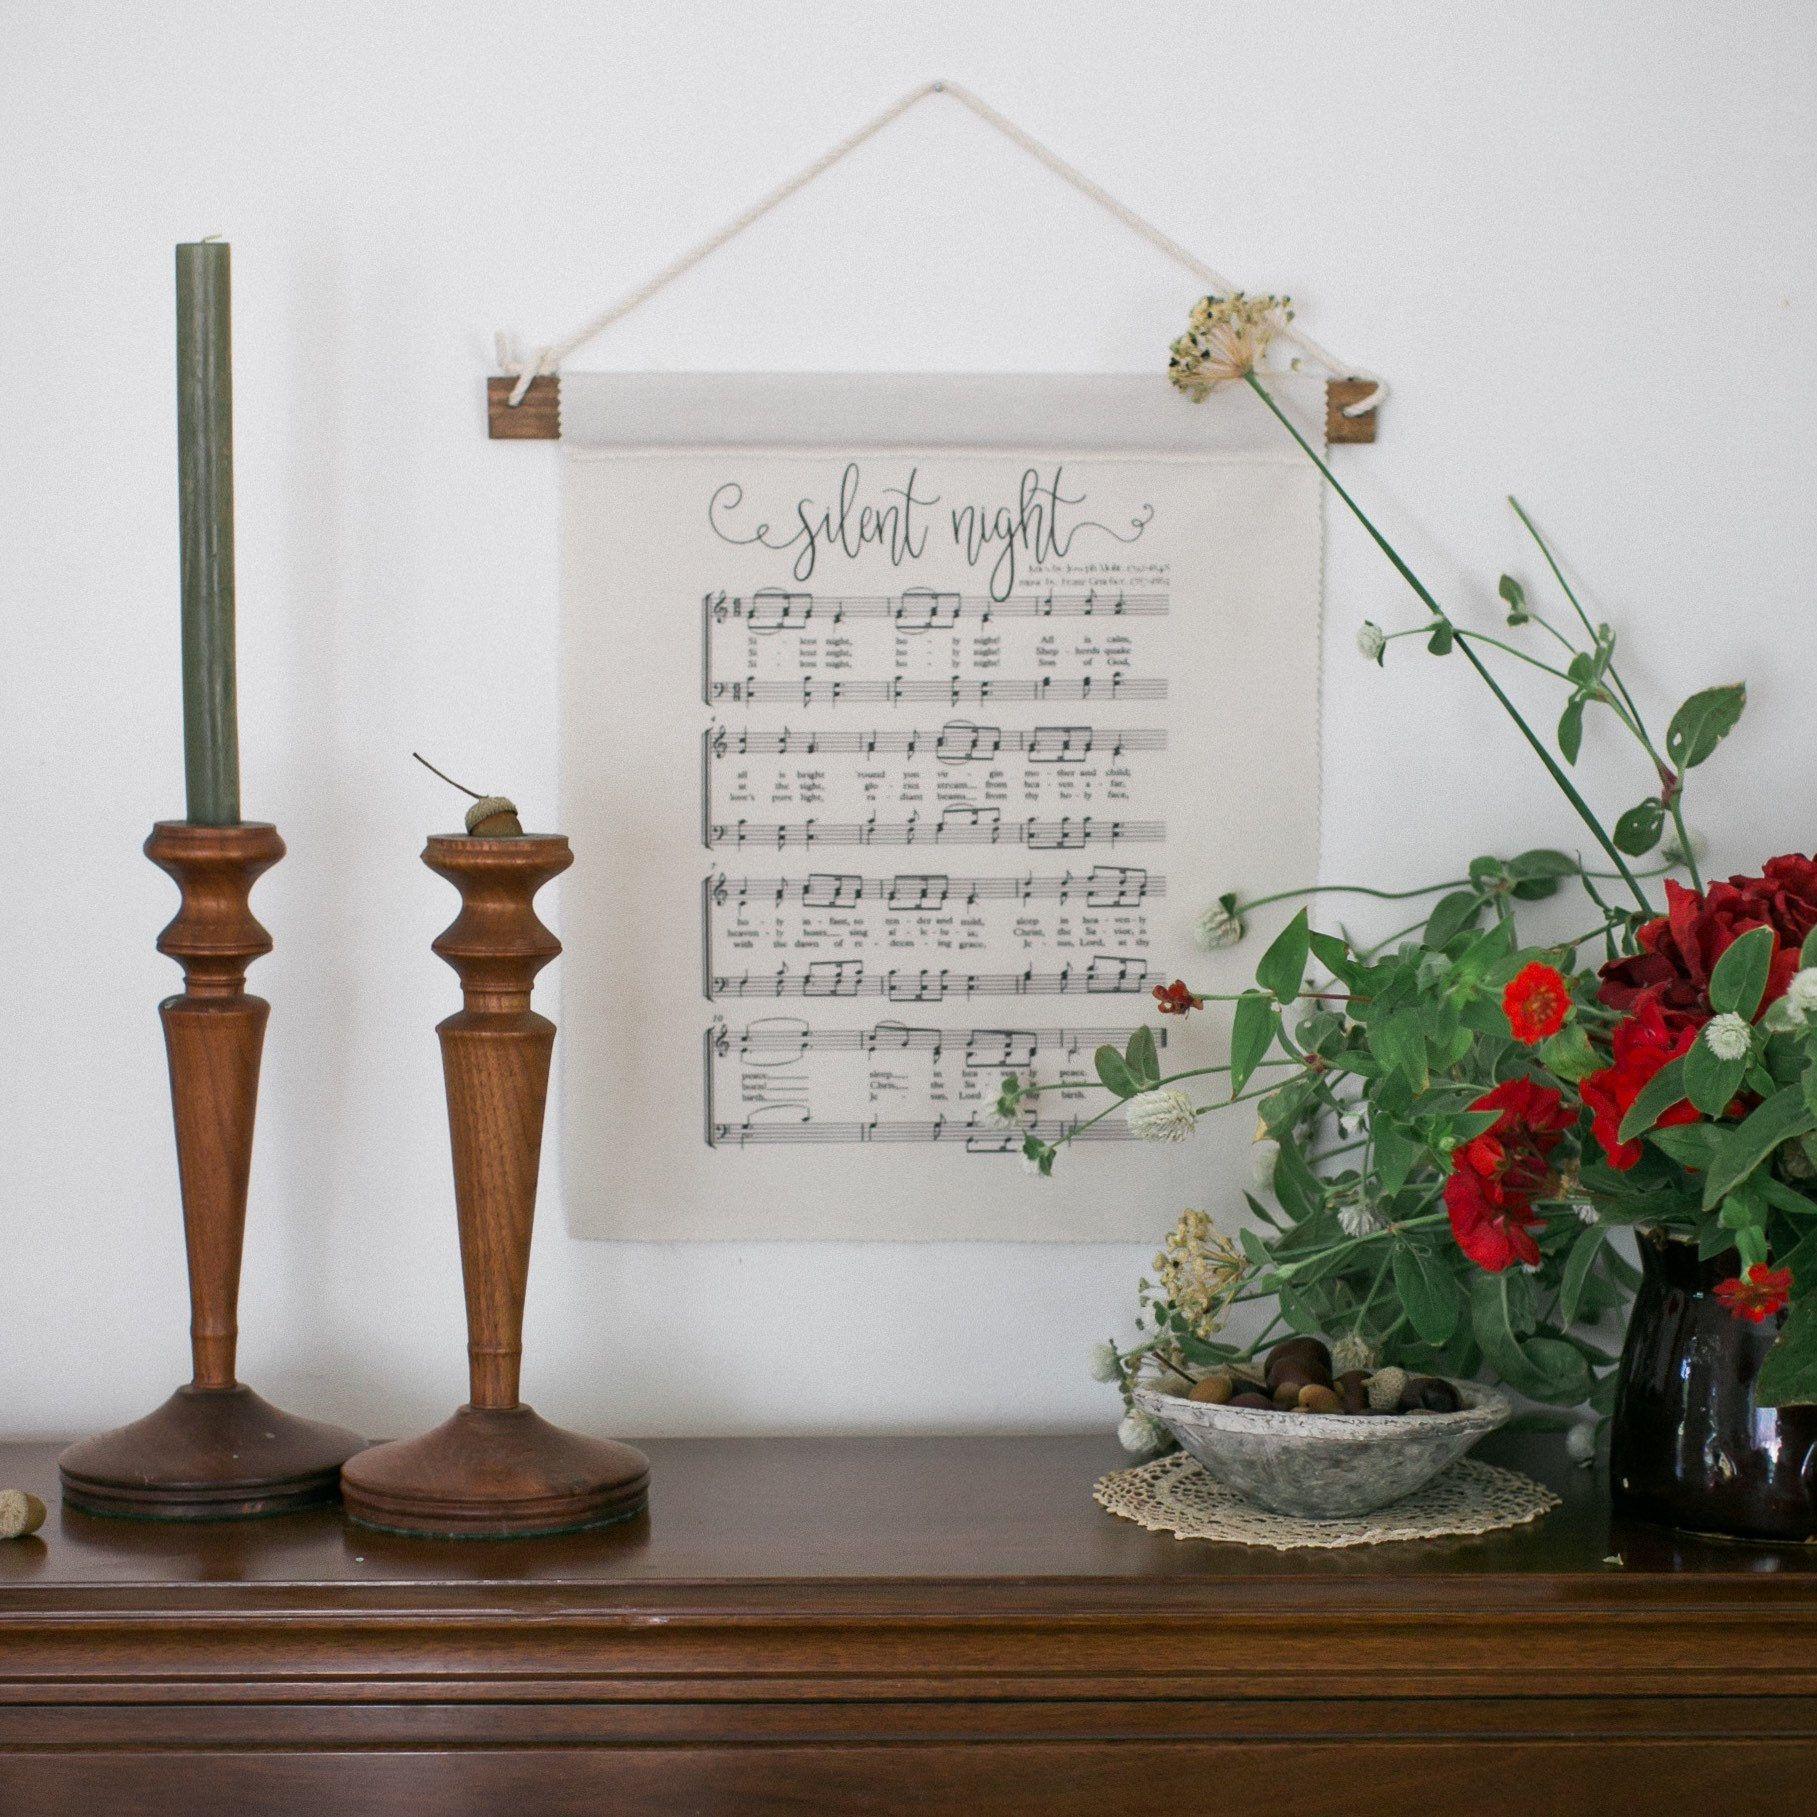 Silent Night Wall Decor  Christmas Song Lyrics  Song Wall Hanging  Music Gift by GrandmaEsthersLegacy on Etsy